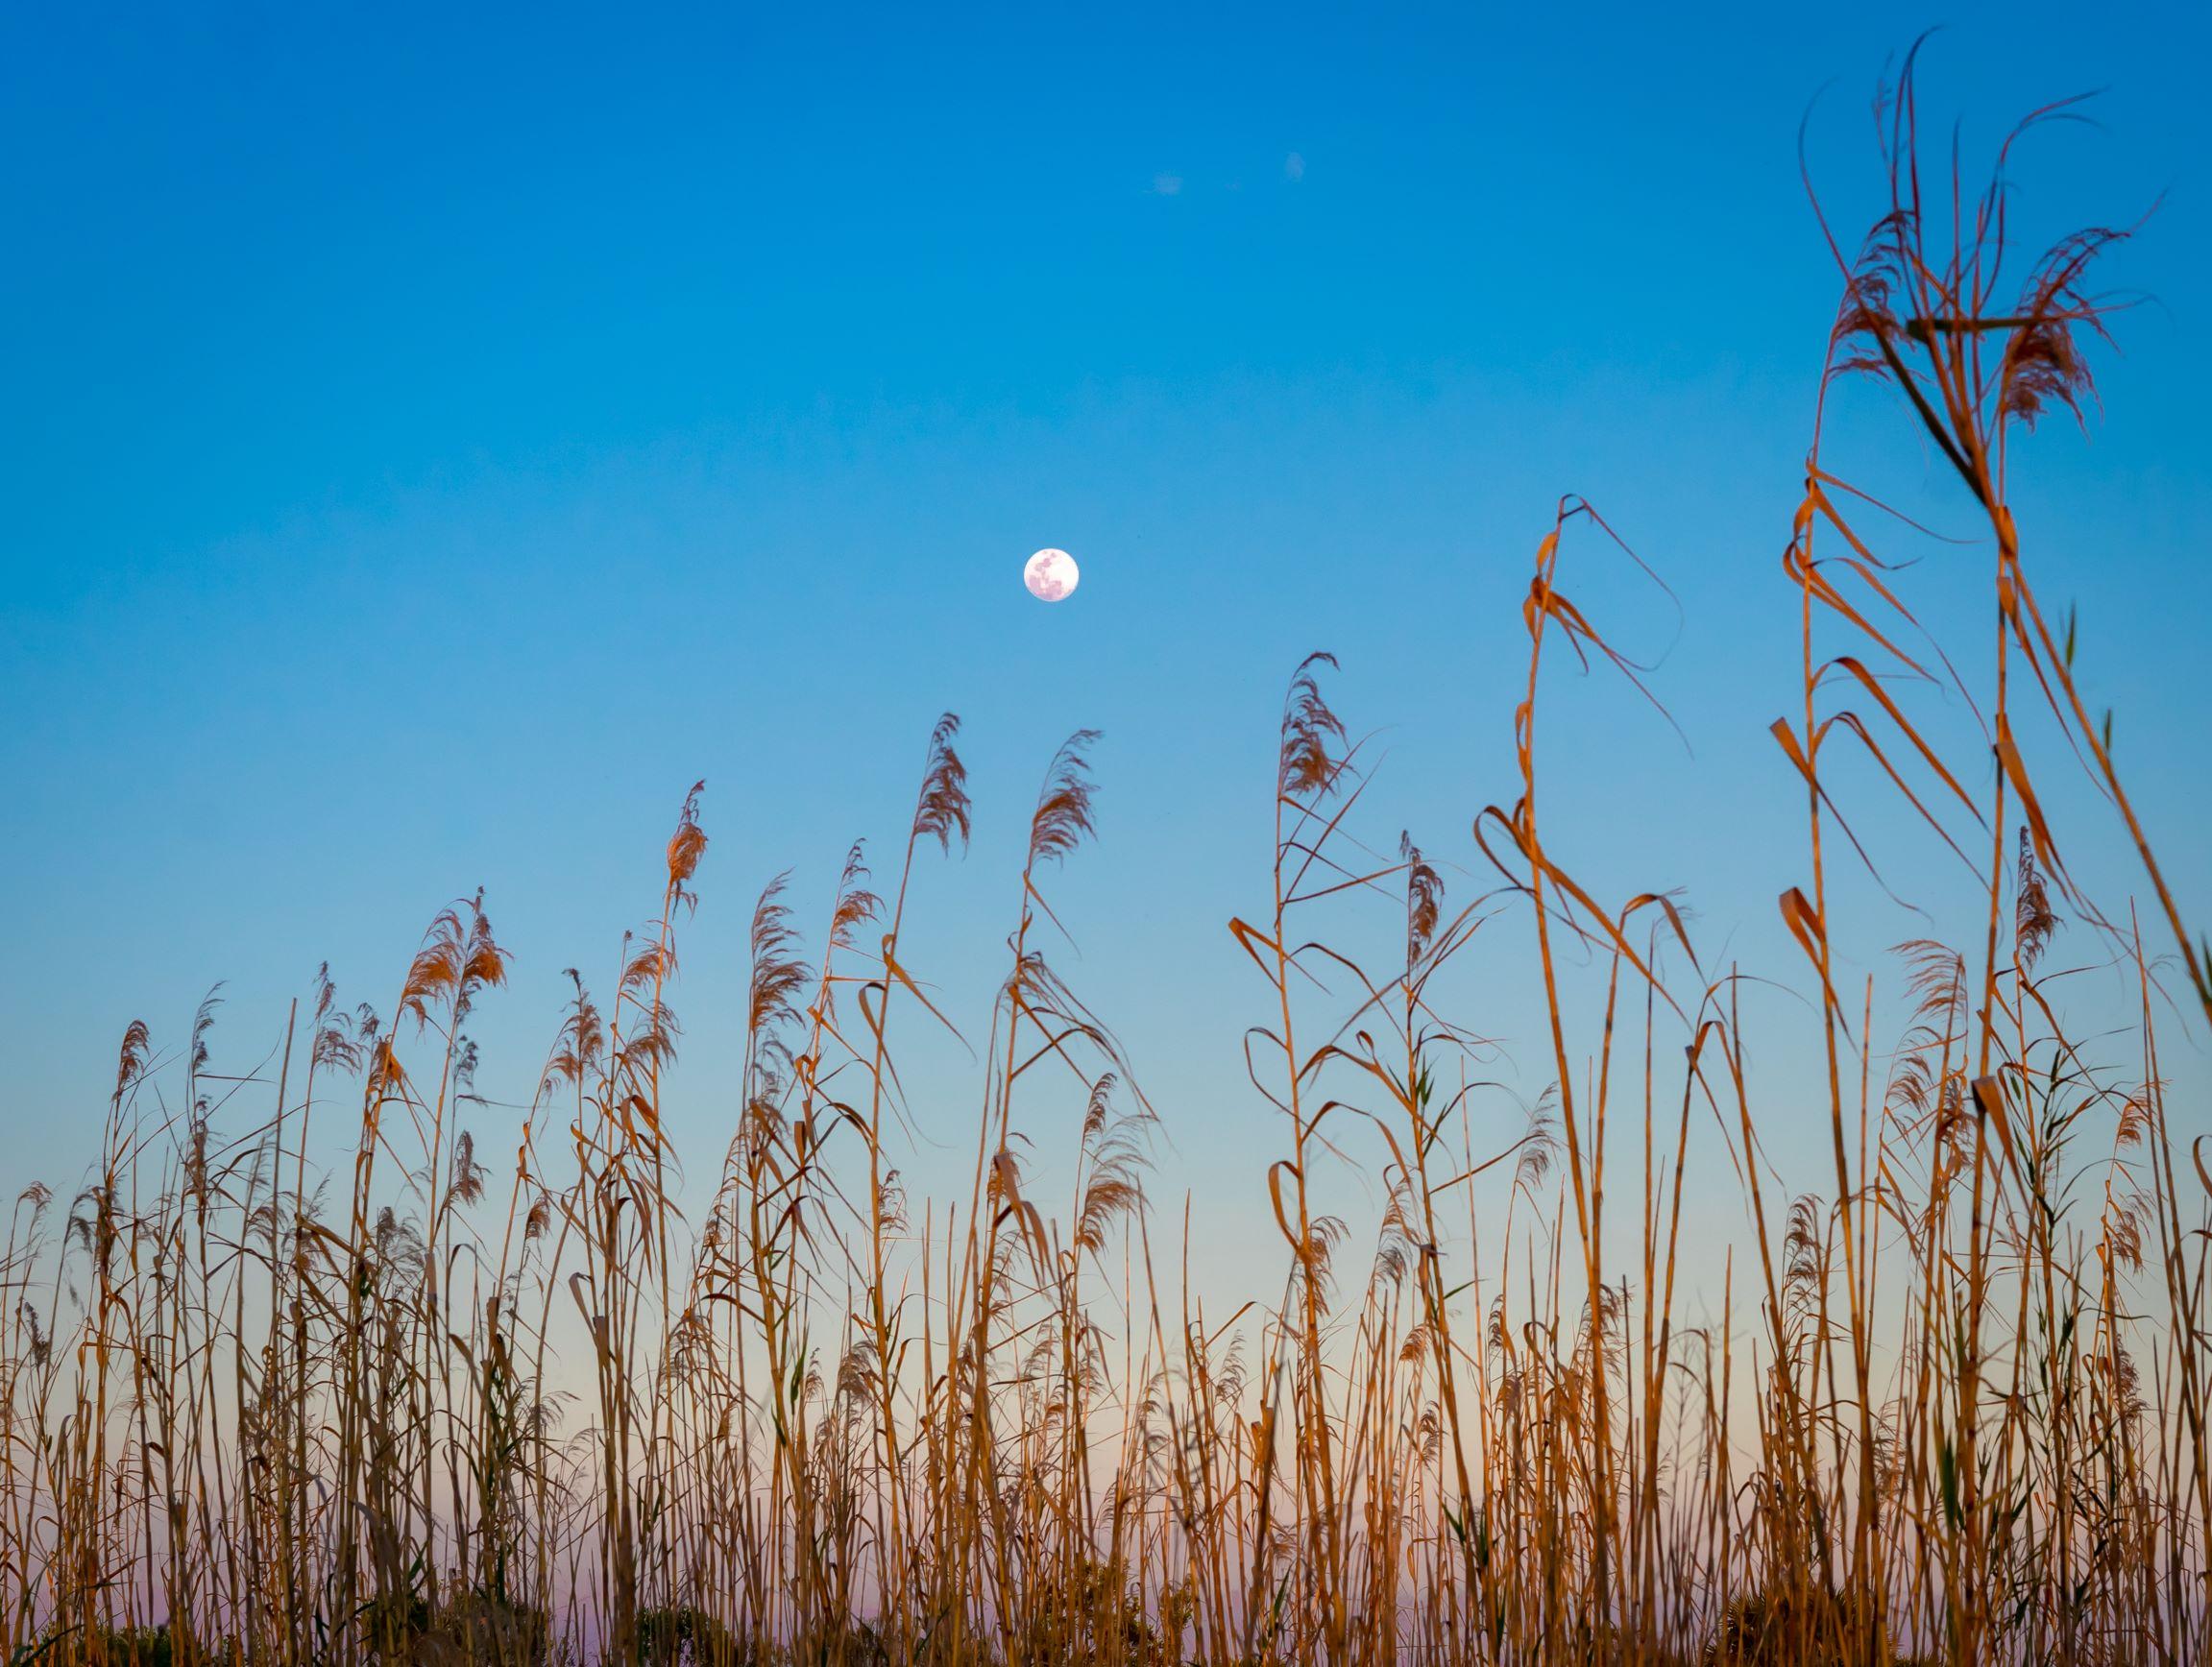 Spring moon, blue sky, golden sea grass swaying.